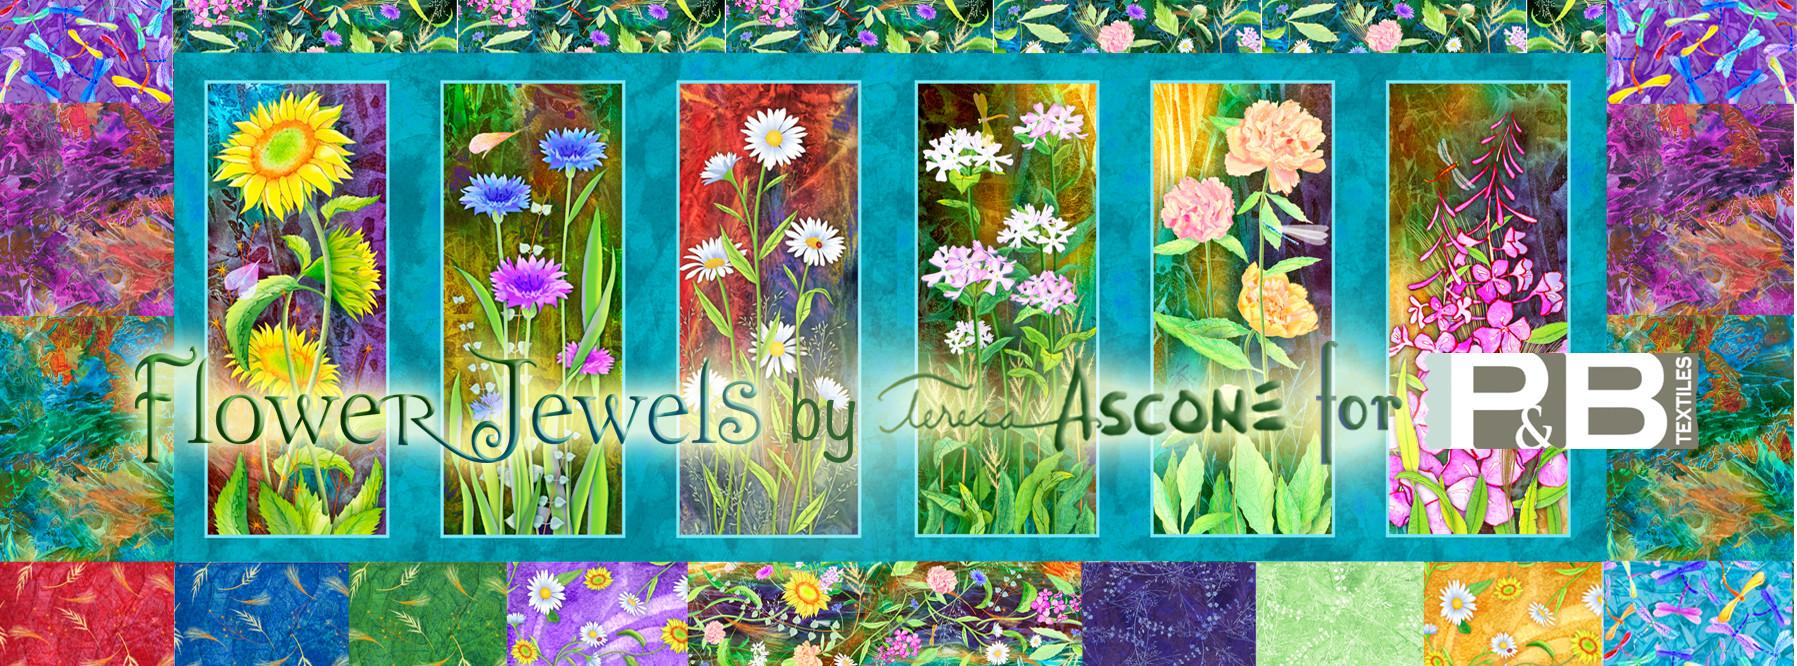 Flower Jewels Fabric